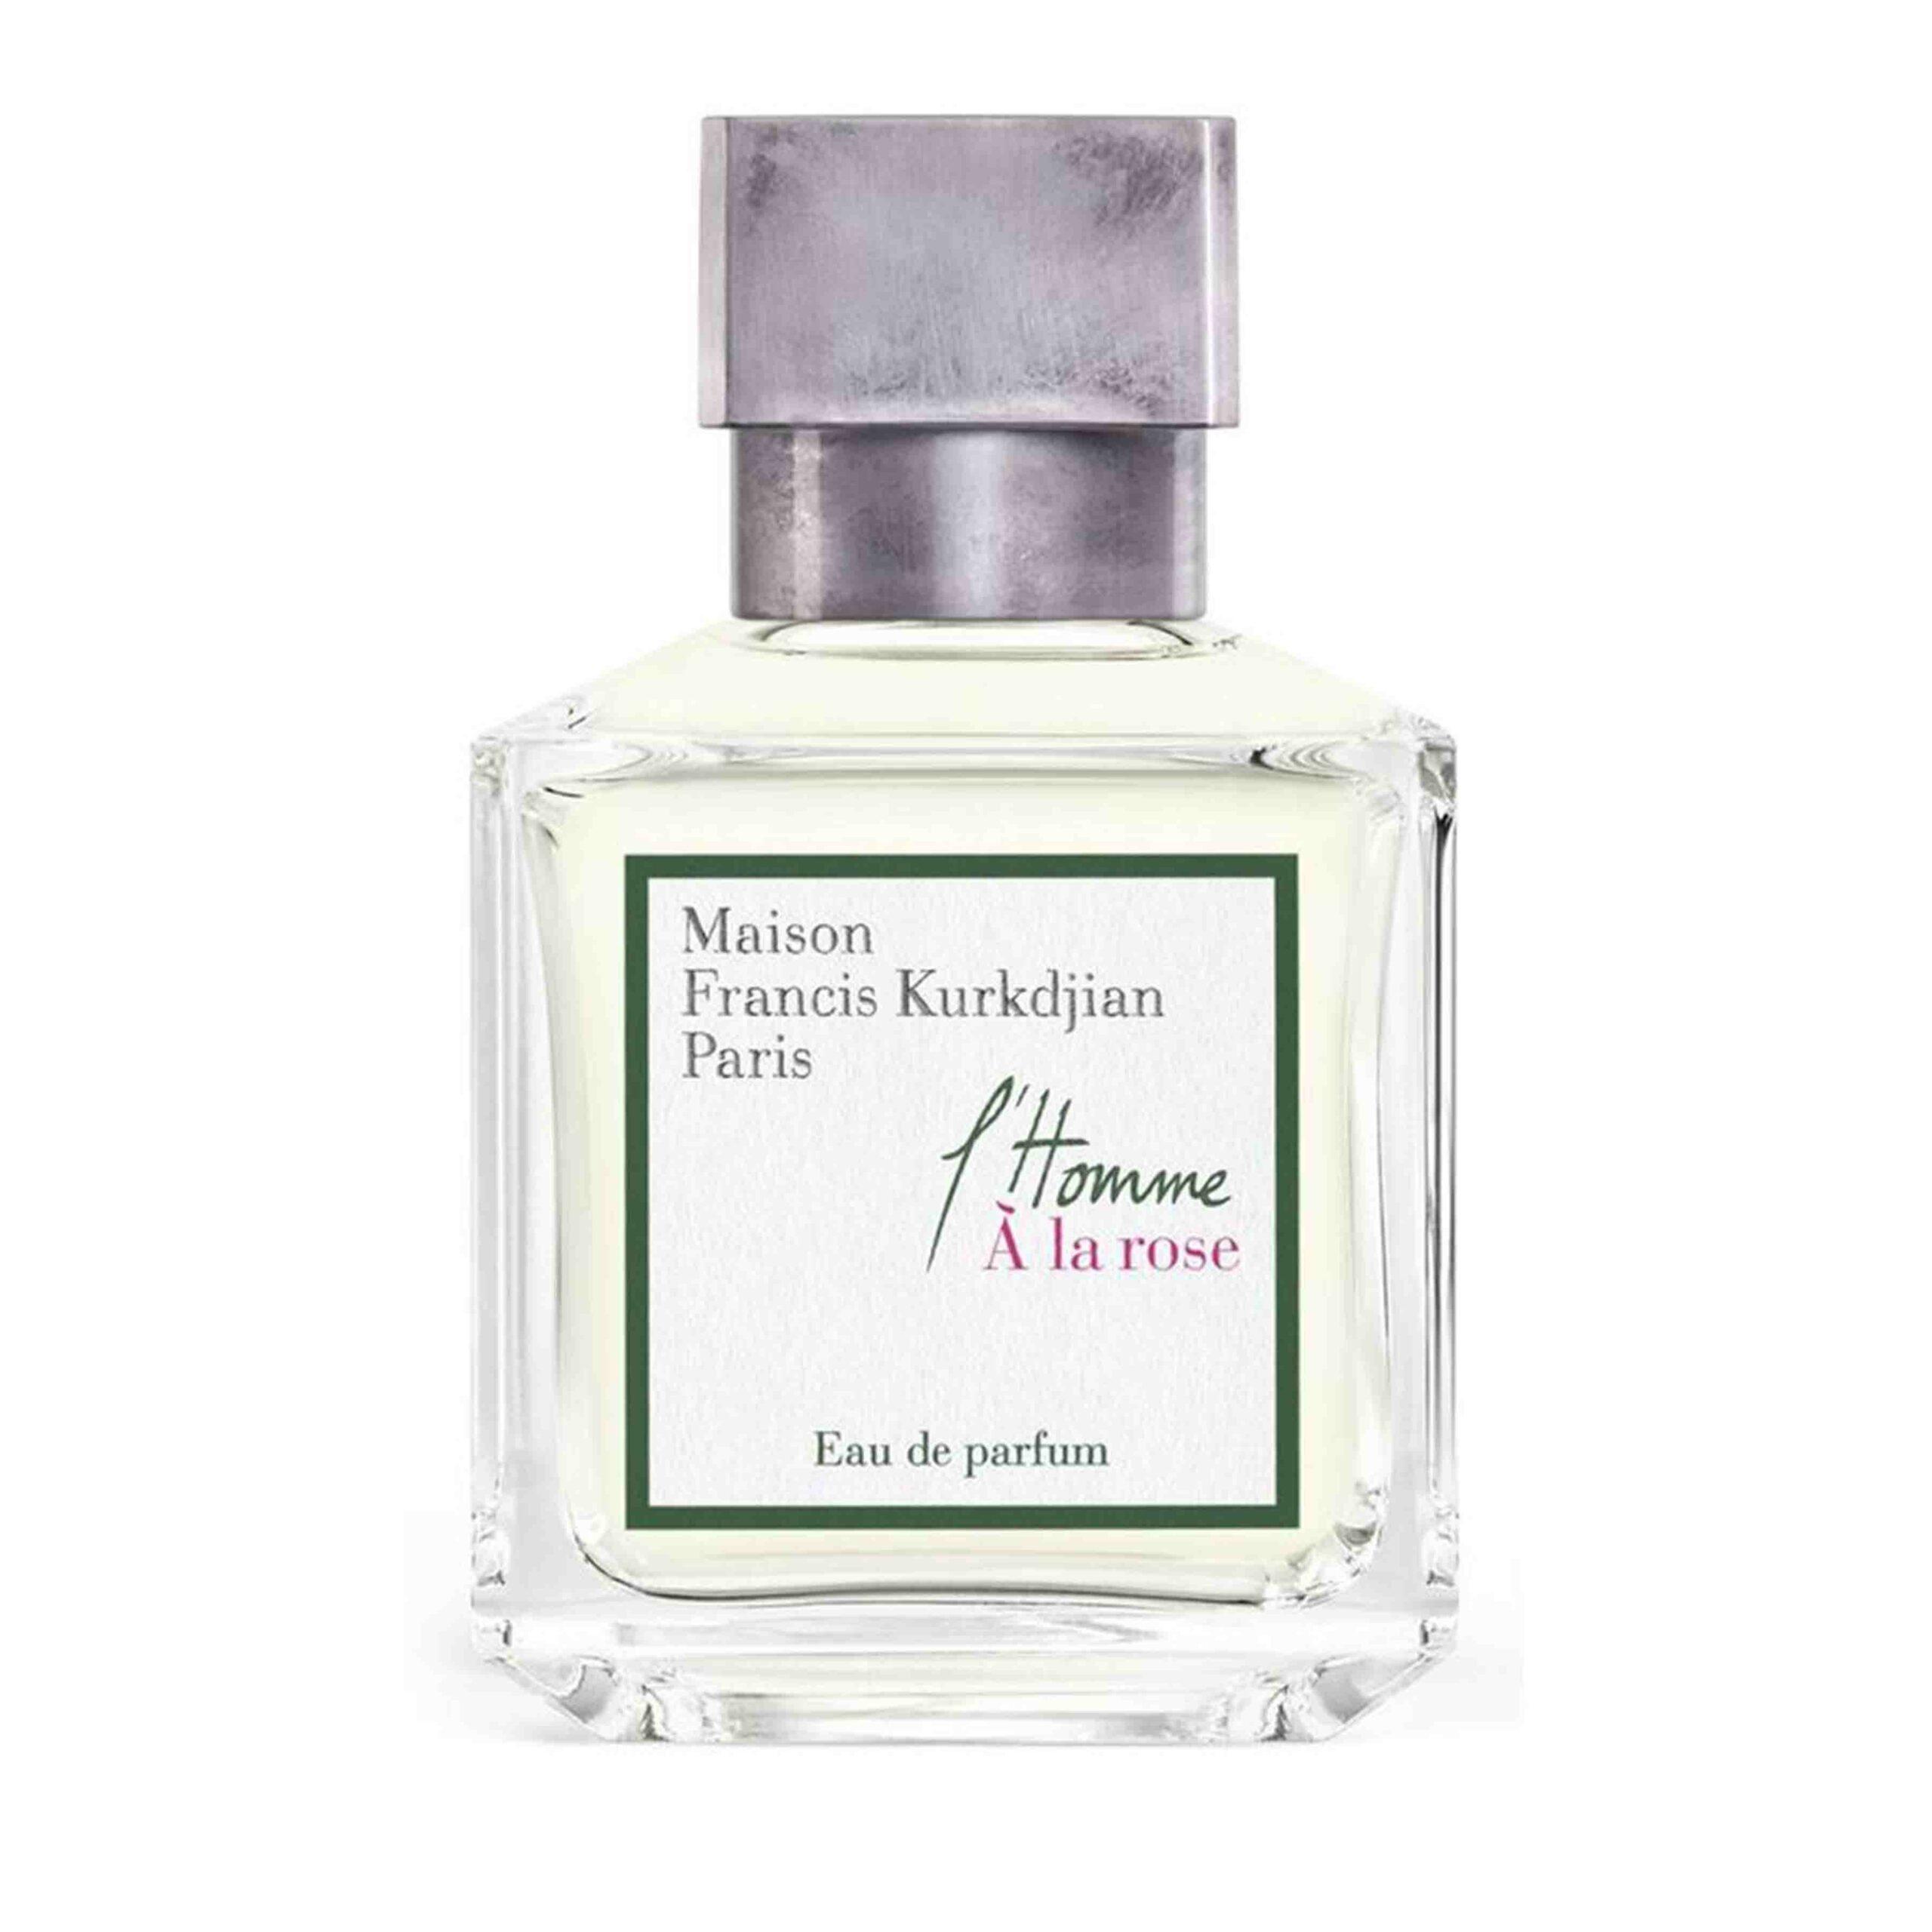 Die besten Parfums für Männer 2021: Maison Francis Kurkdjian - L'Homme à la Rose